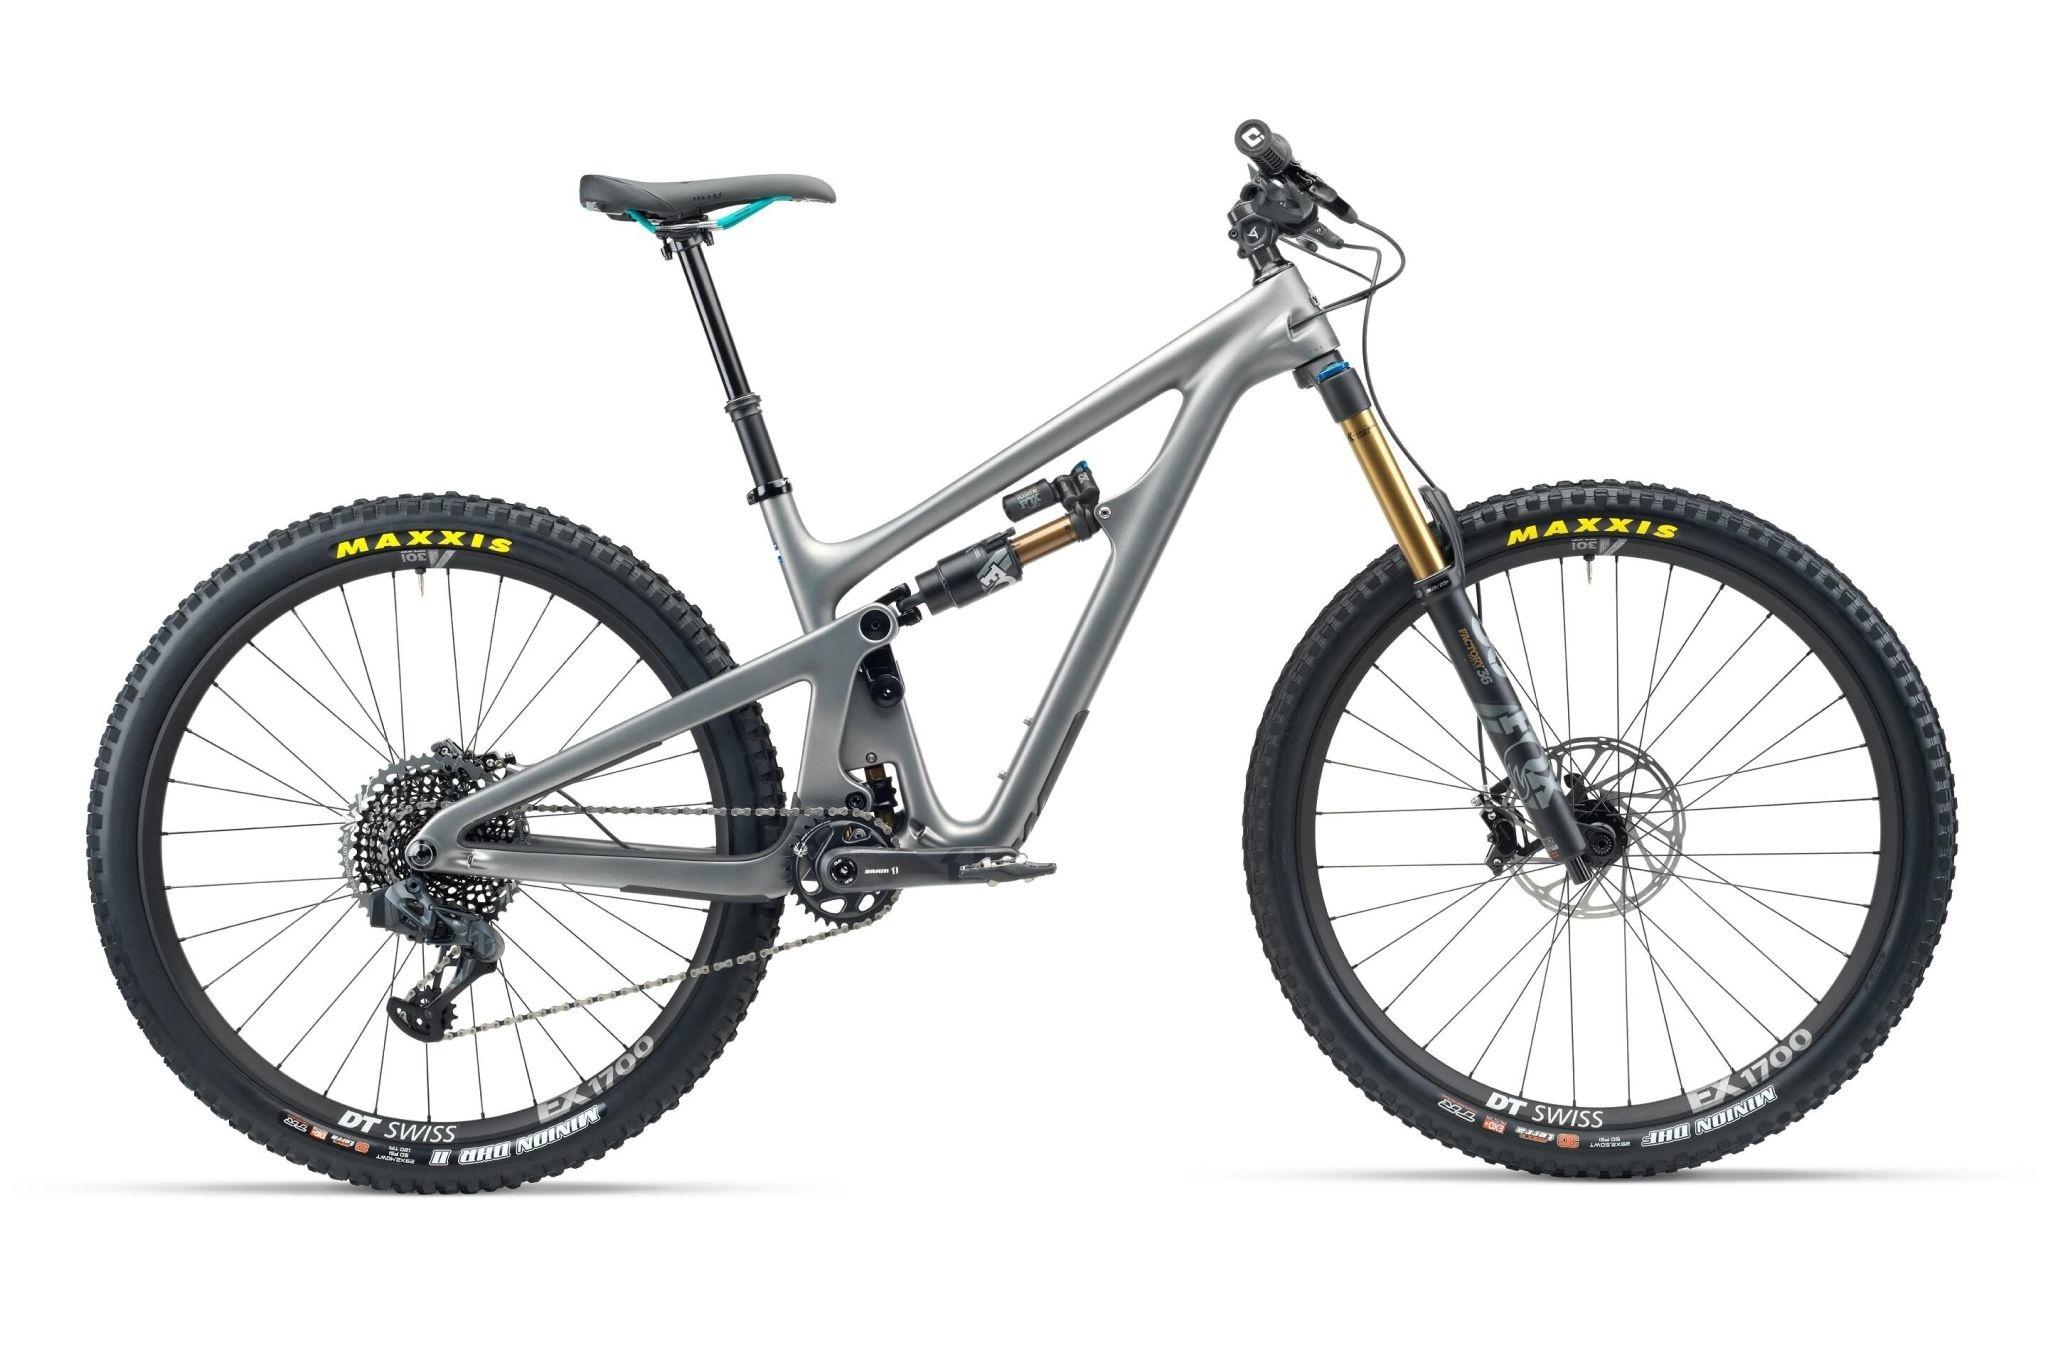 Yeti Cycles 20 Yeti SB150 T-series w/ T3 kit